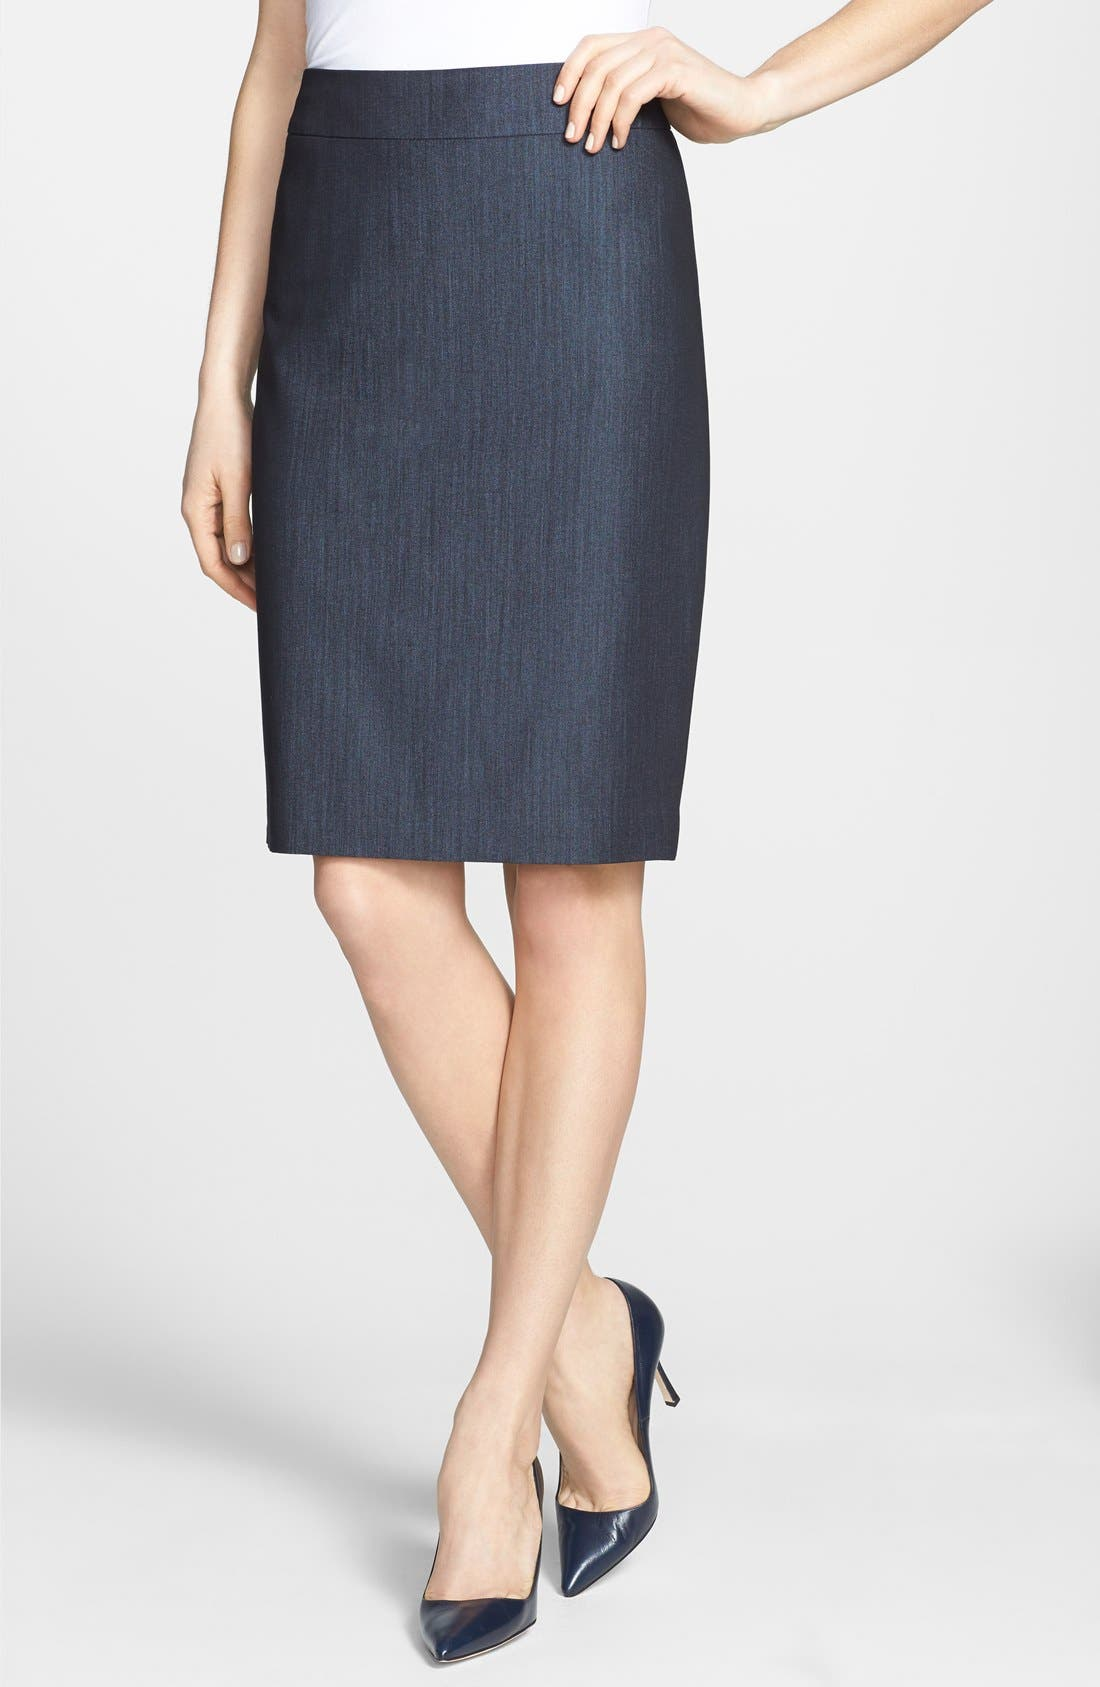 Alternate Image 1 Selected - Jones New York 'Lucy - Seasonless Stretch' Pencil Skirt